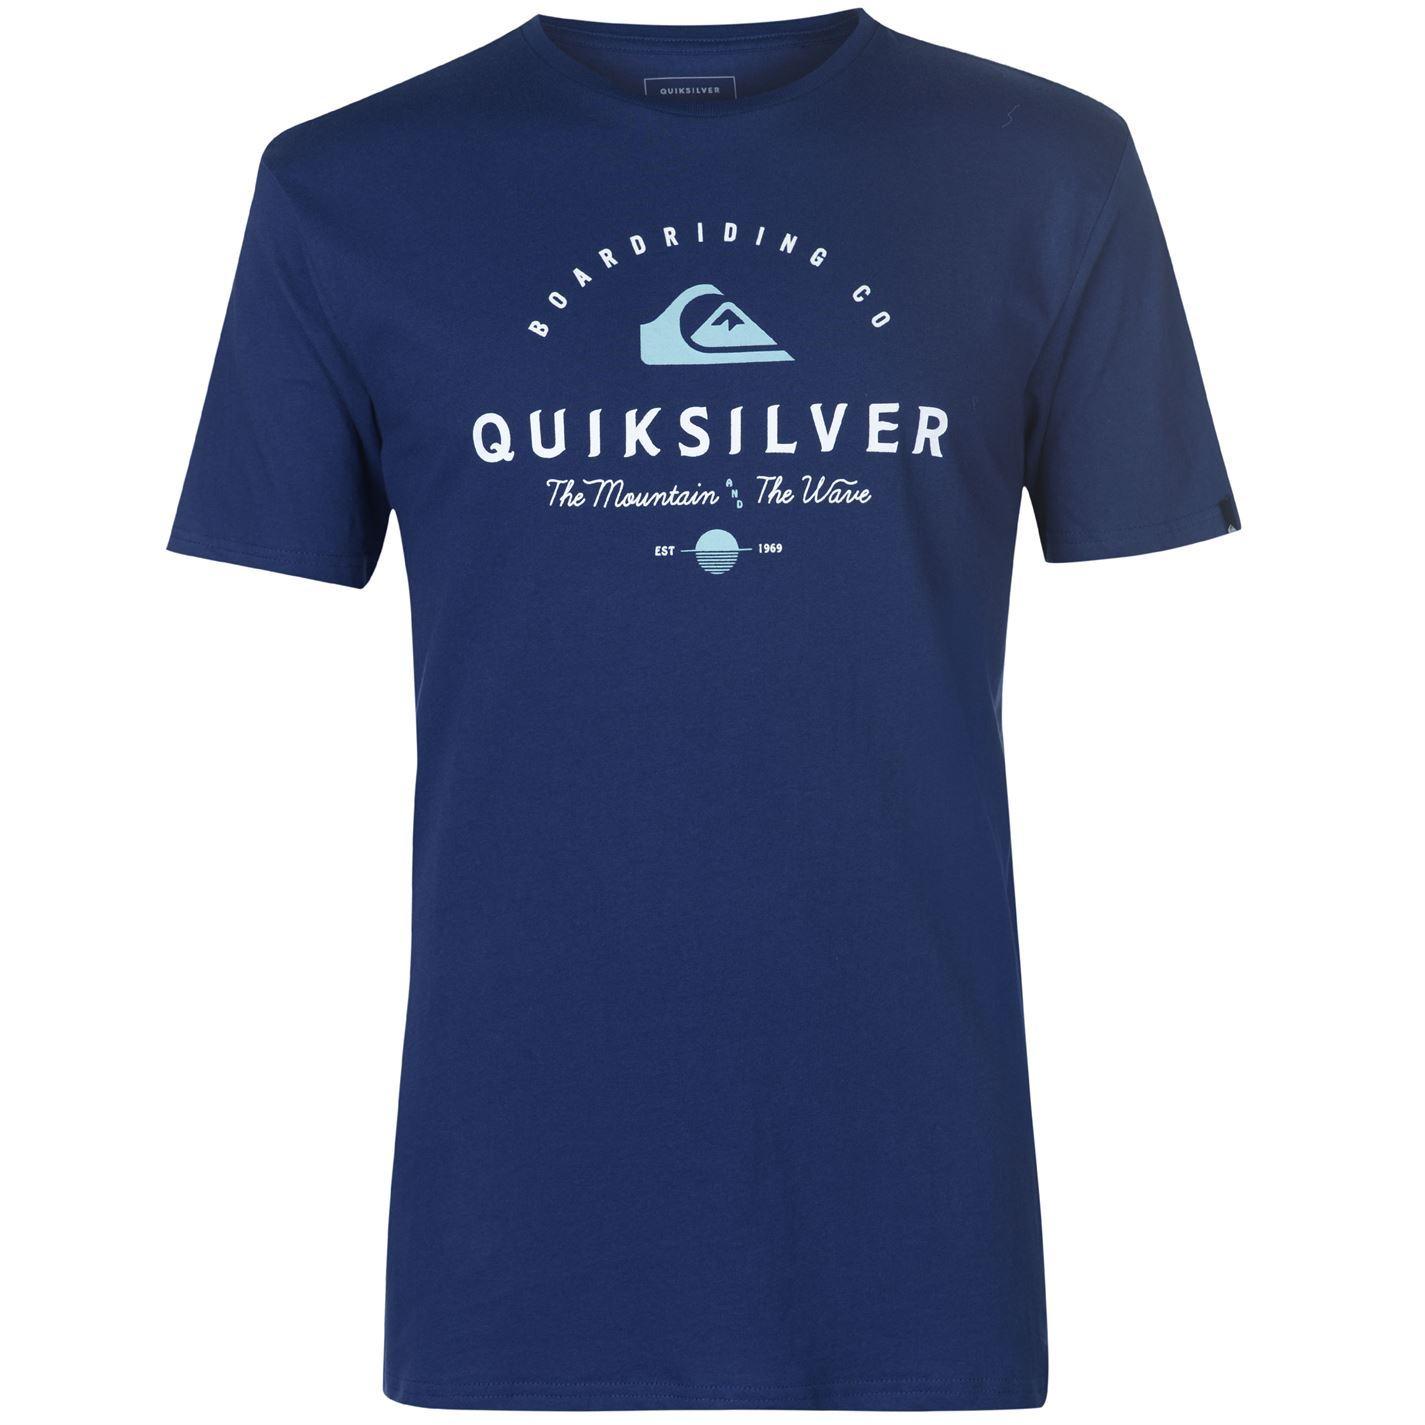 Quiksilver-Working-Man-T-Shirt-Mens-Tee-Shirt-Top thumbnail 3